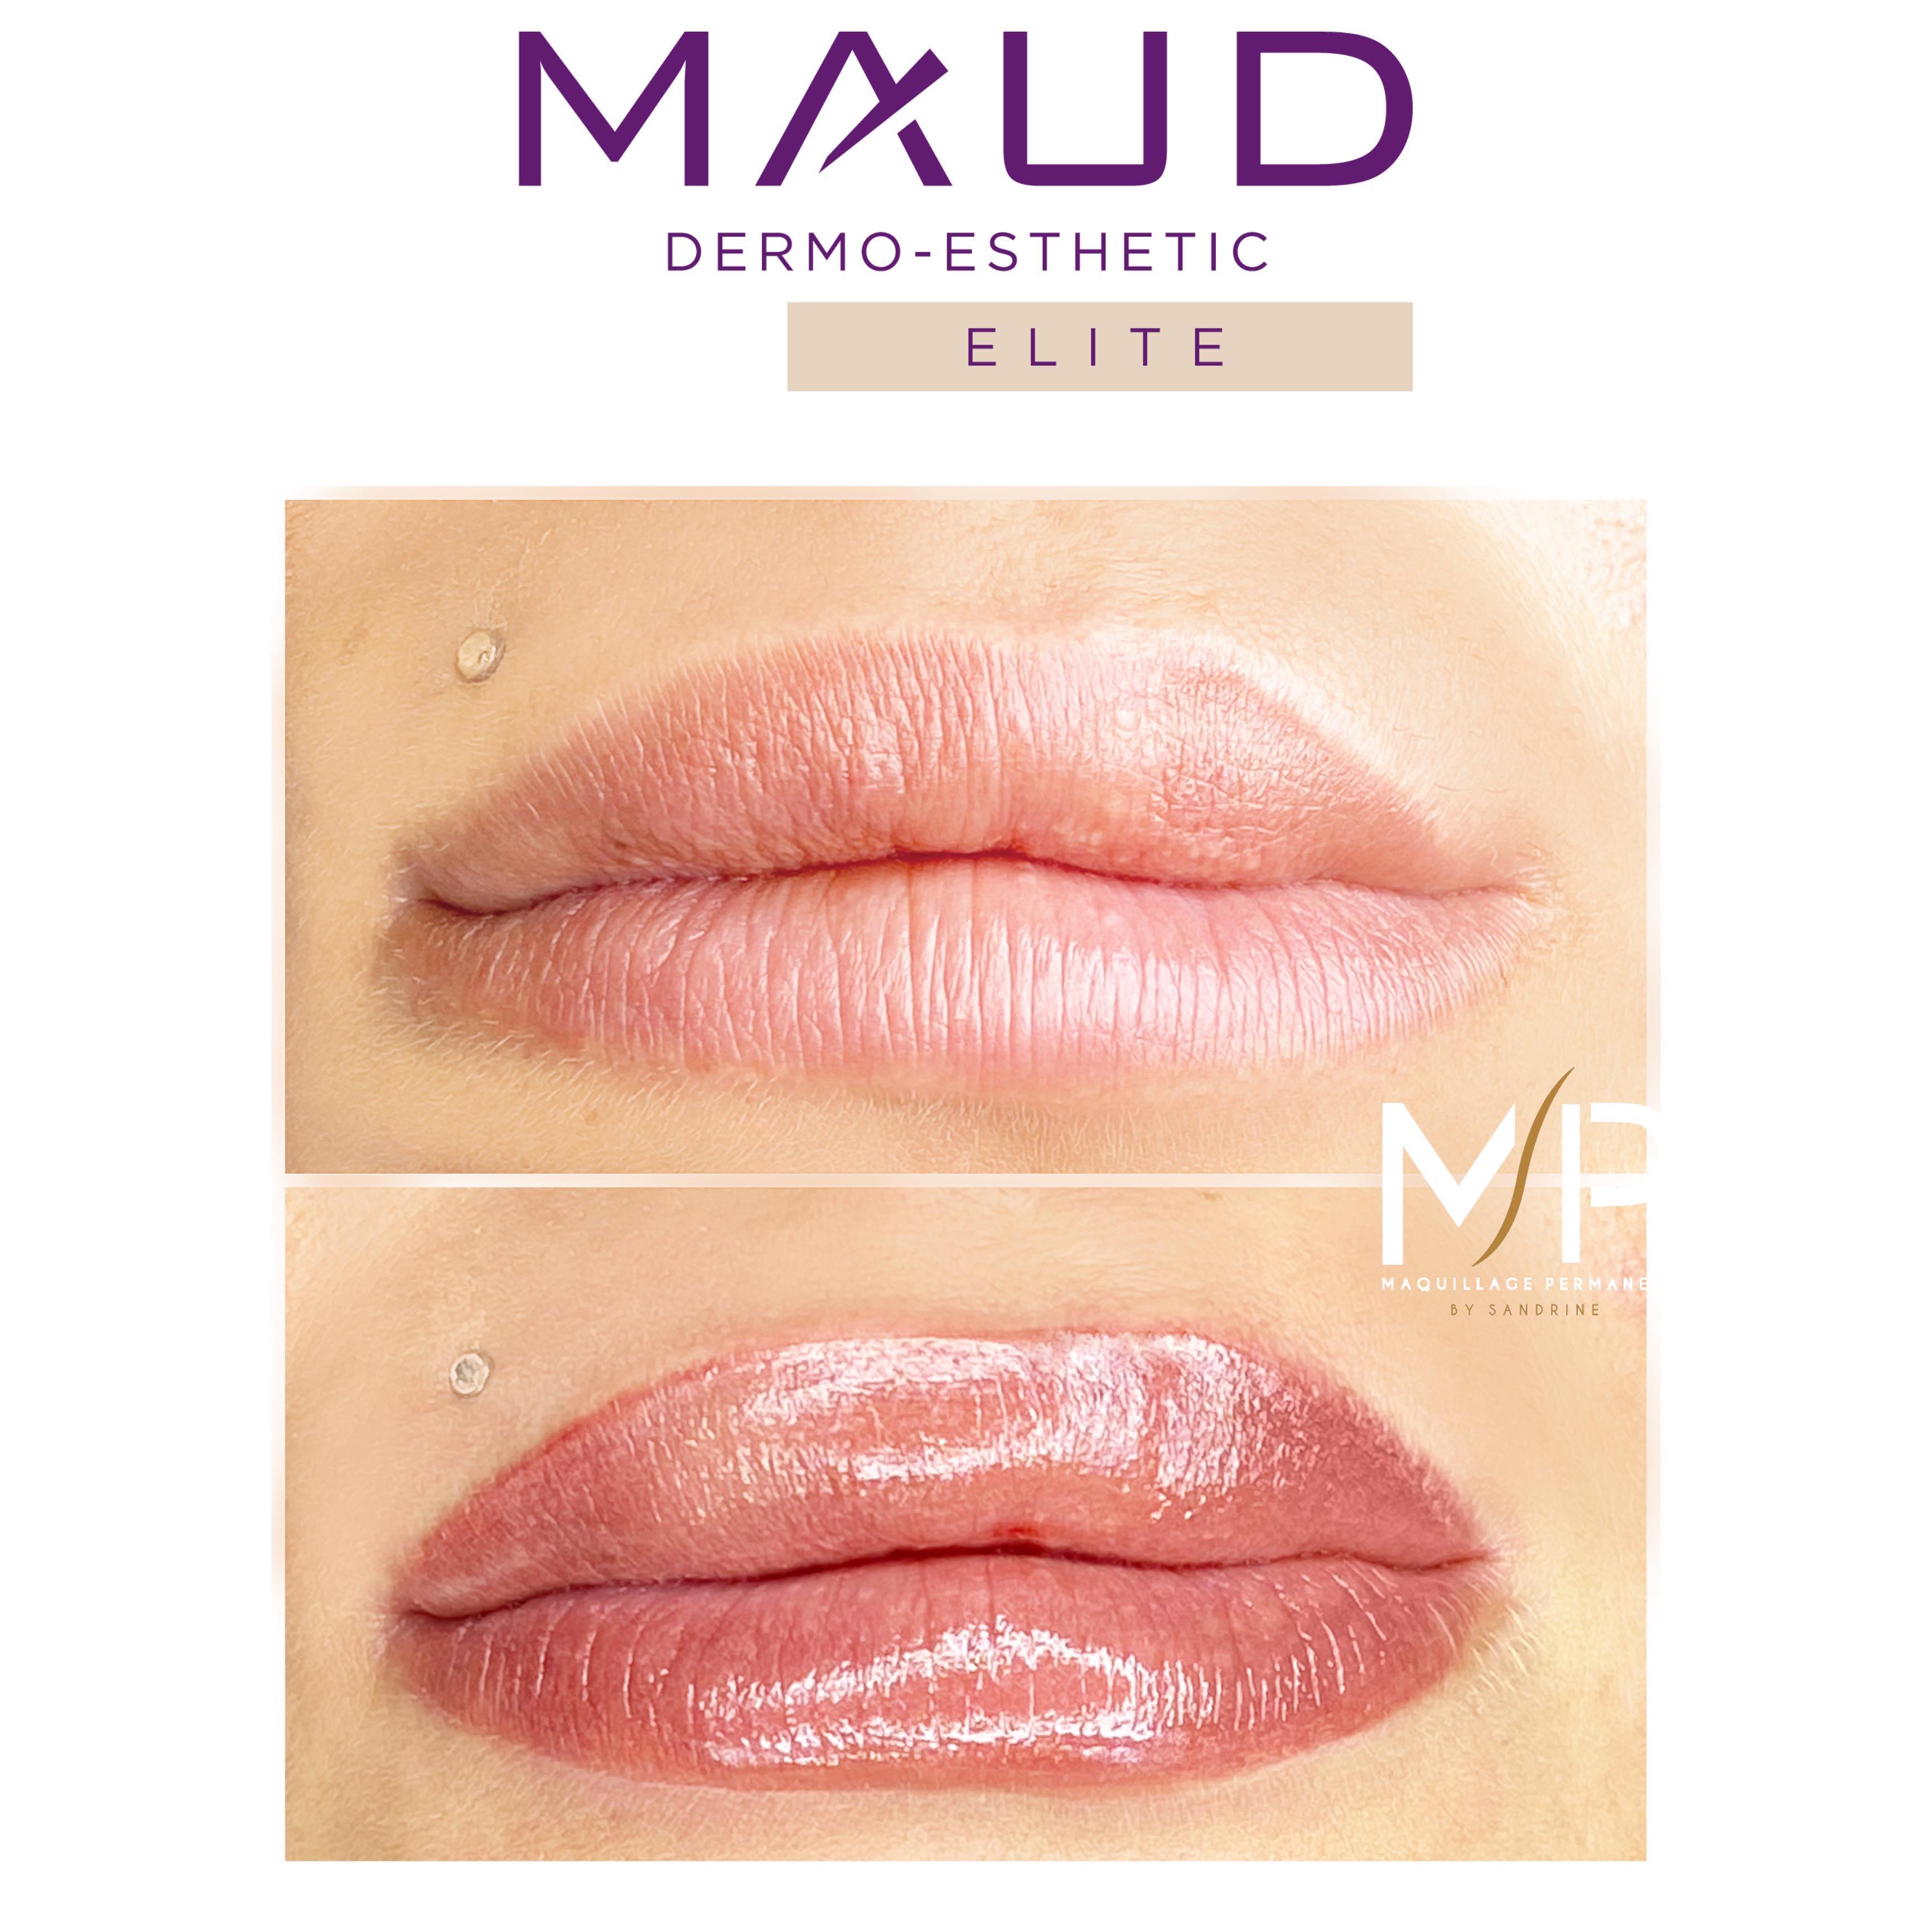 BEAUTY FULL LIPS® by Maud Elite. Maquillage permanent des lèvres Montpellier. Dermochromatique